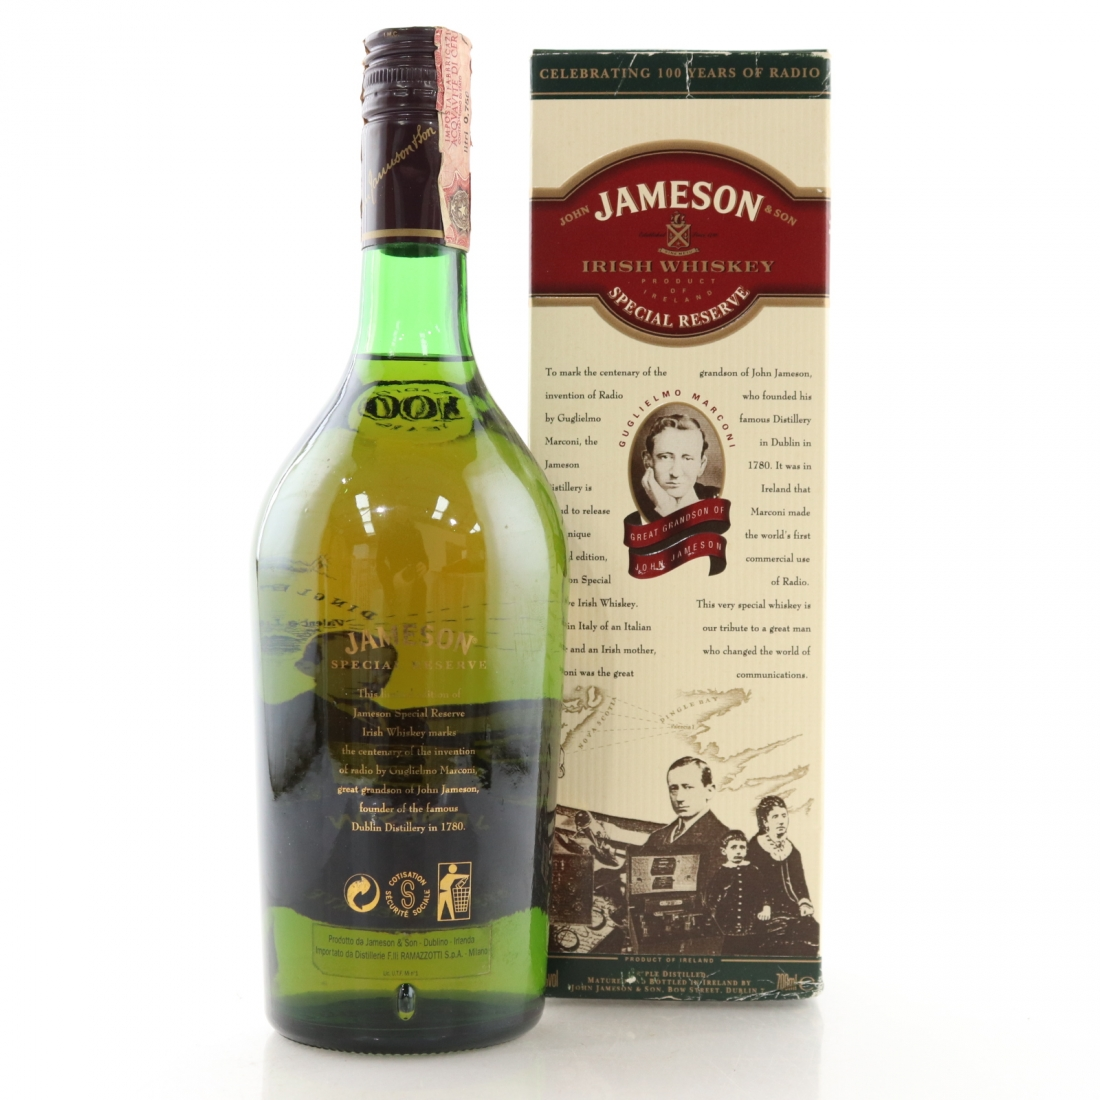 Jameson Special Reserve / 100 Years of Radio